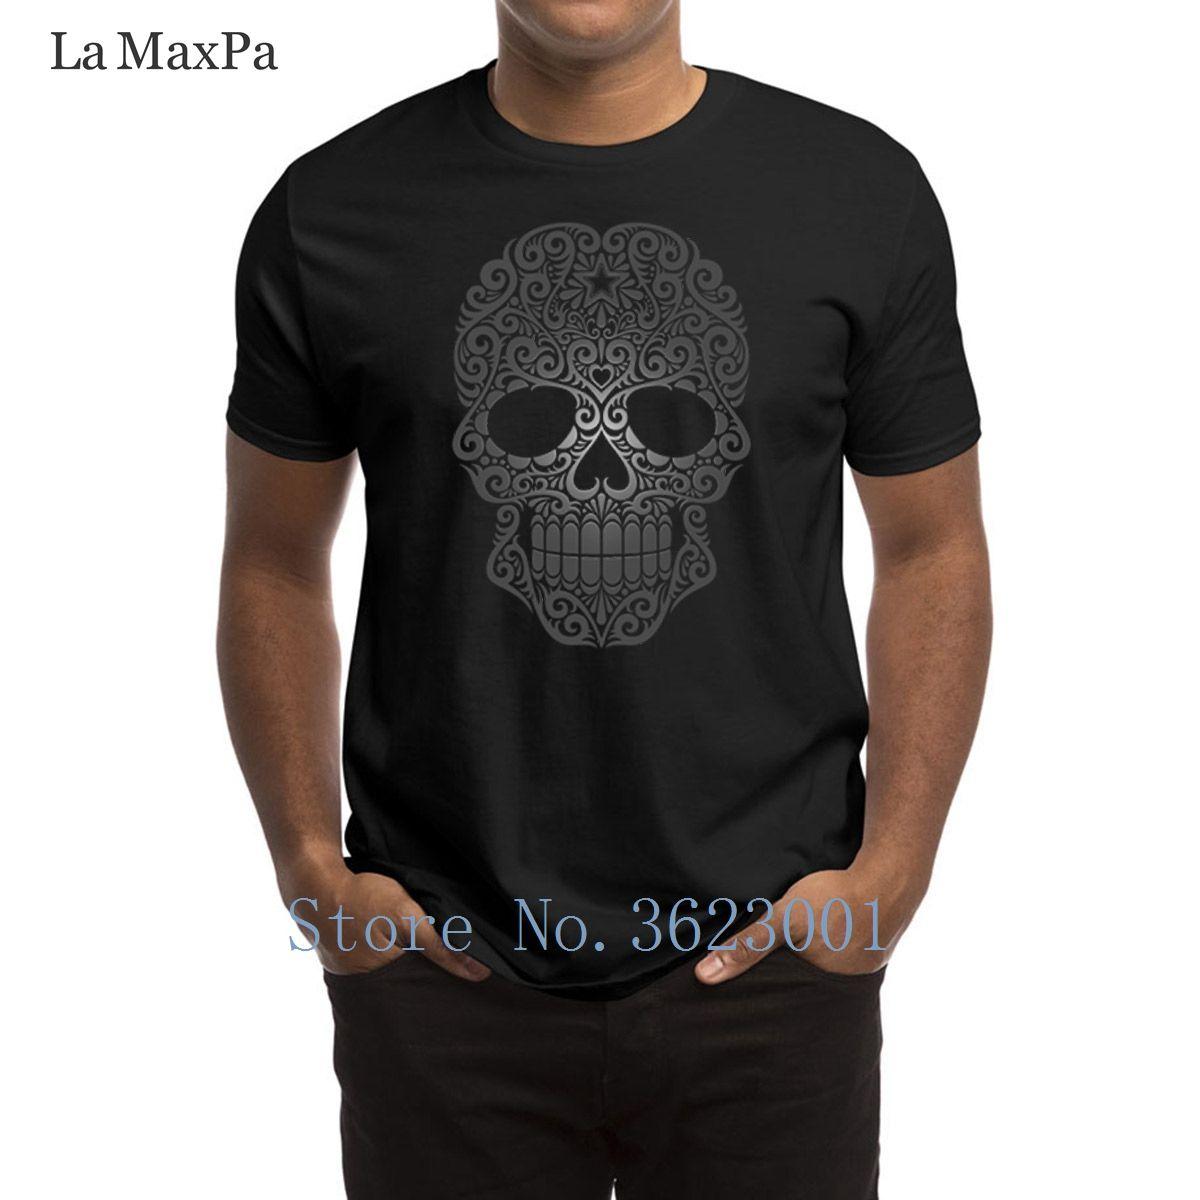 Printing Normal Mens T Shirt Dark Swirling Sugar Skull T Shirt